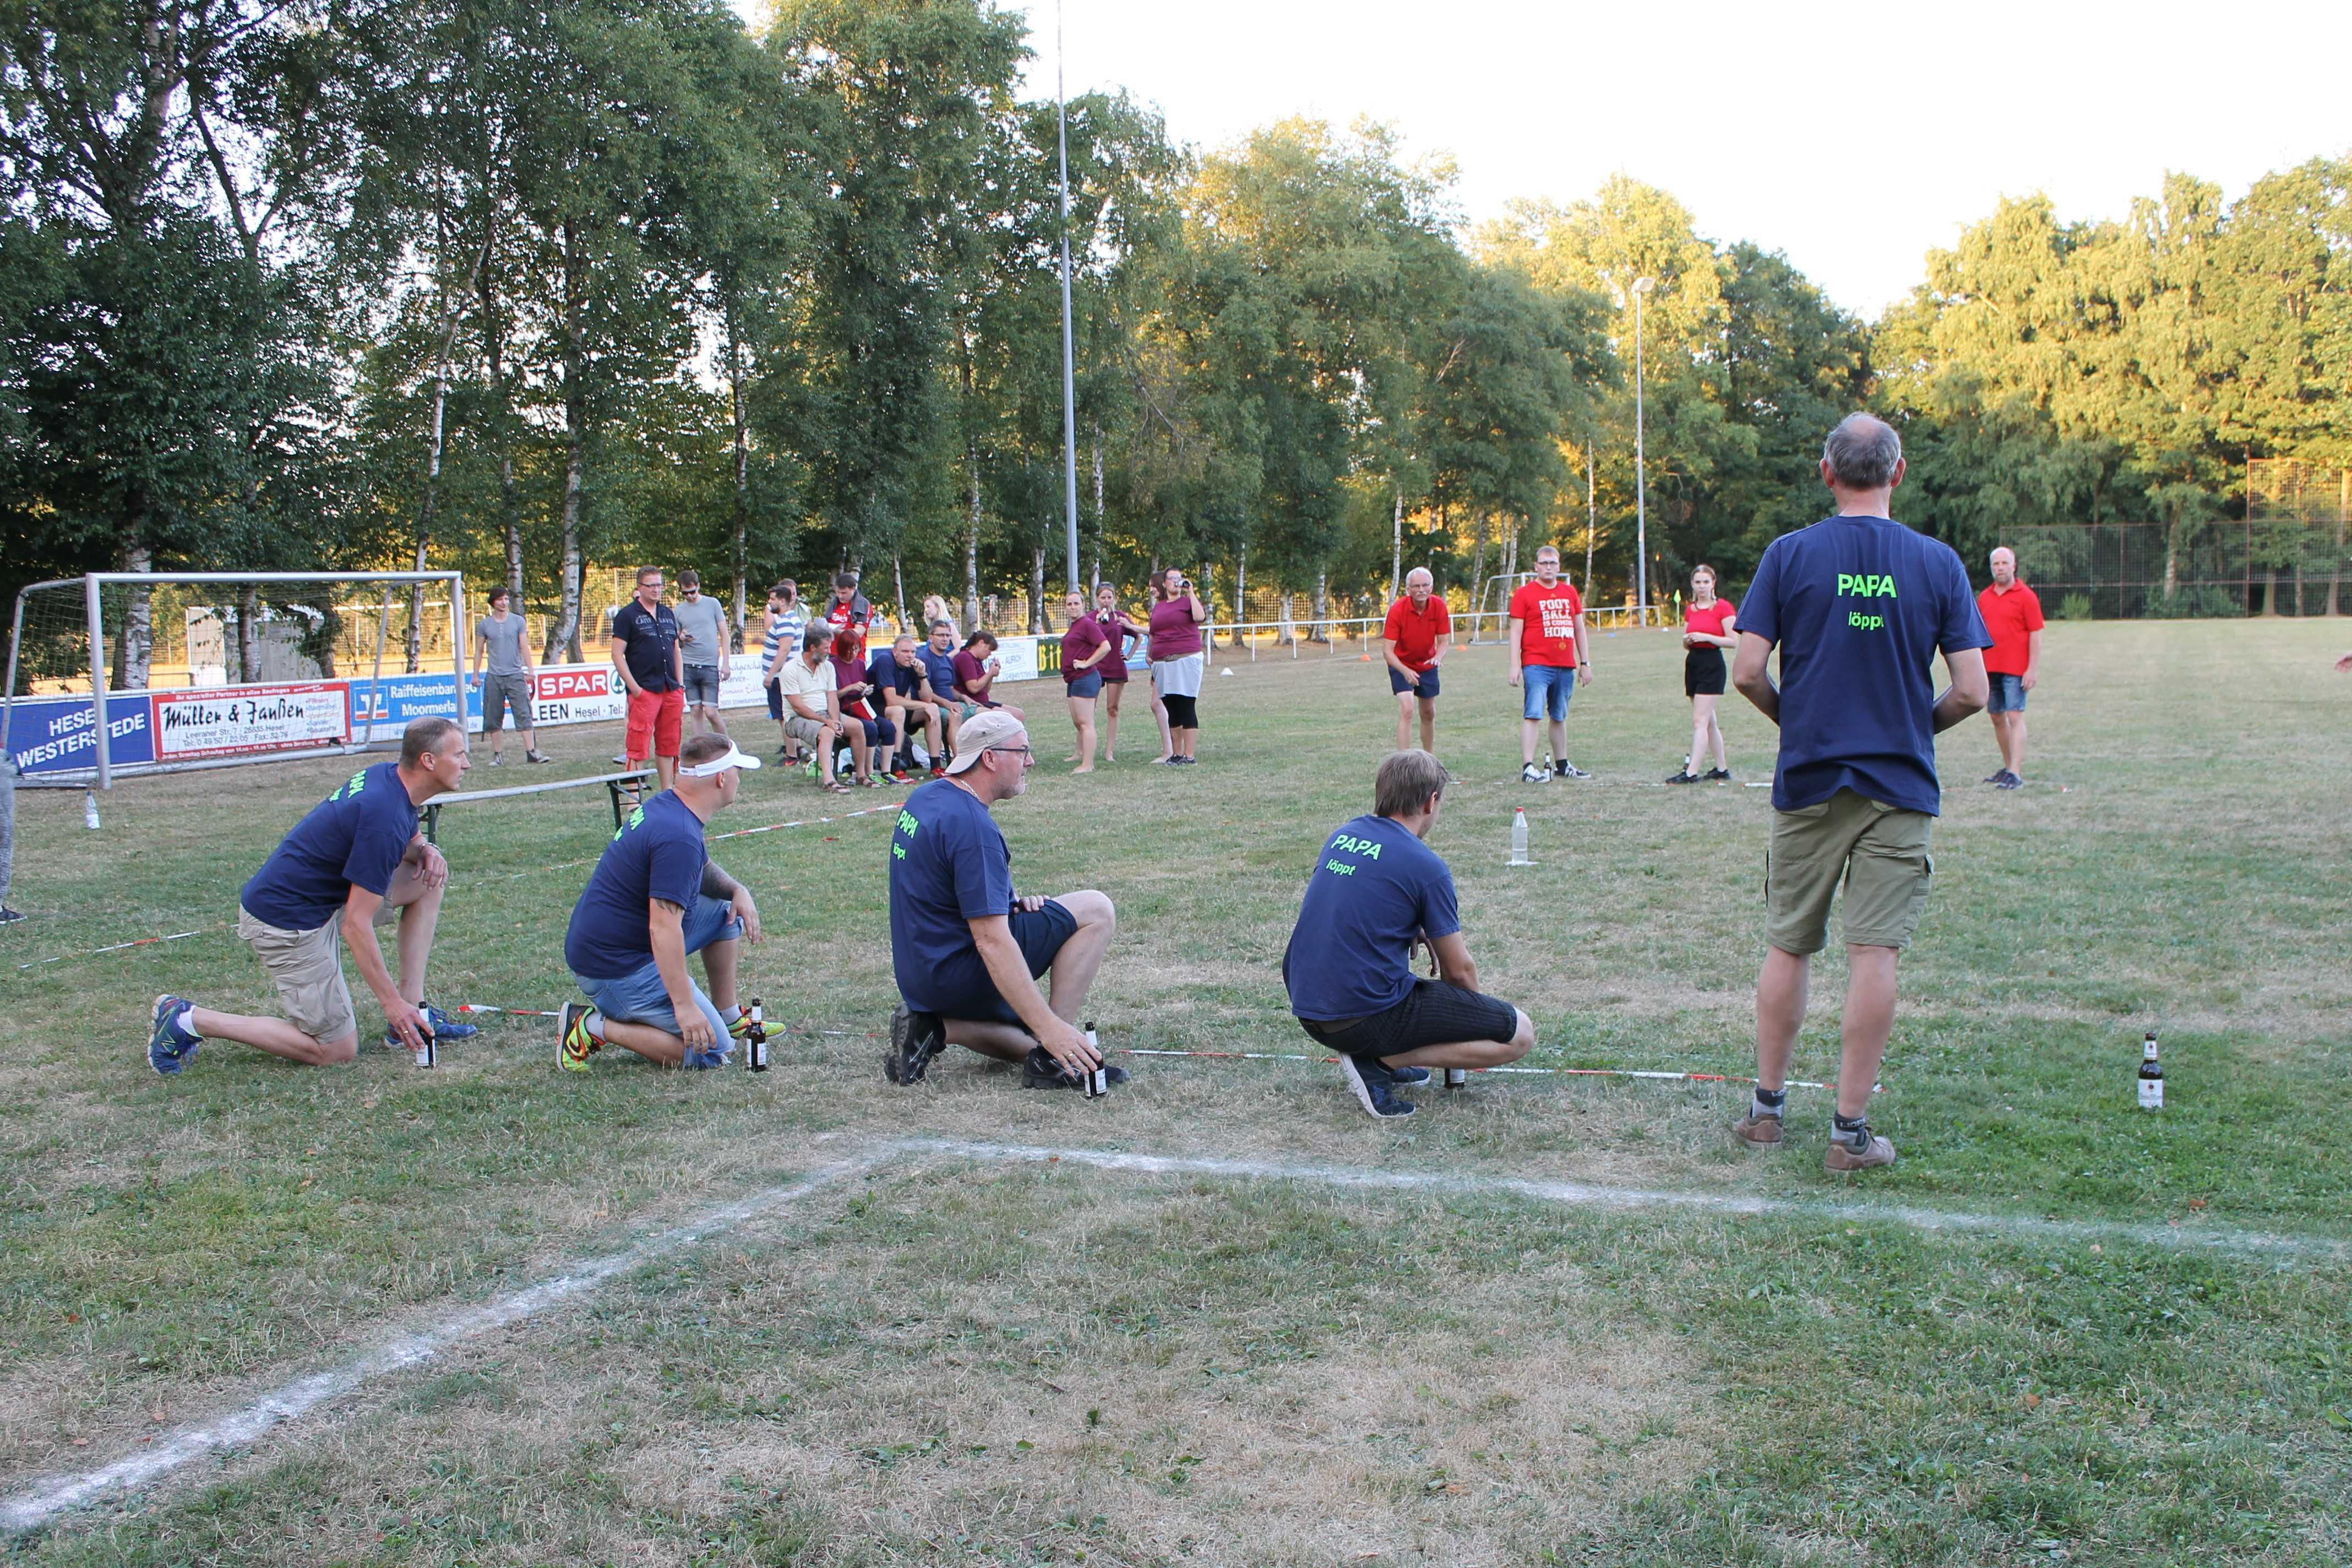 2018-07-27 Sportwoche - Flunkyball Turnier (56)